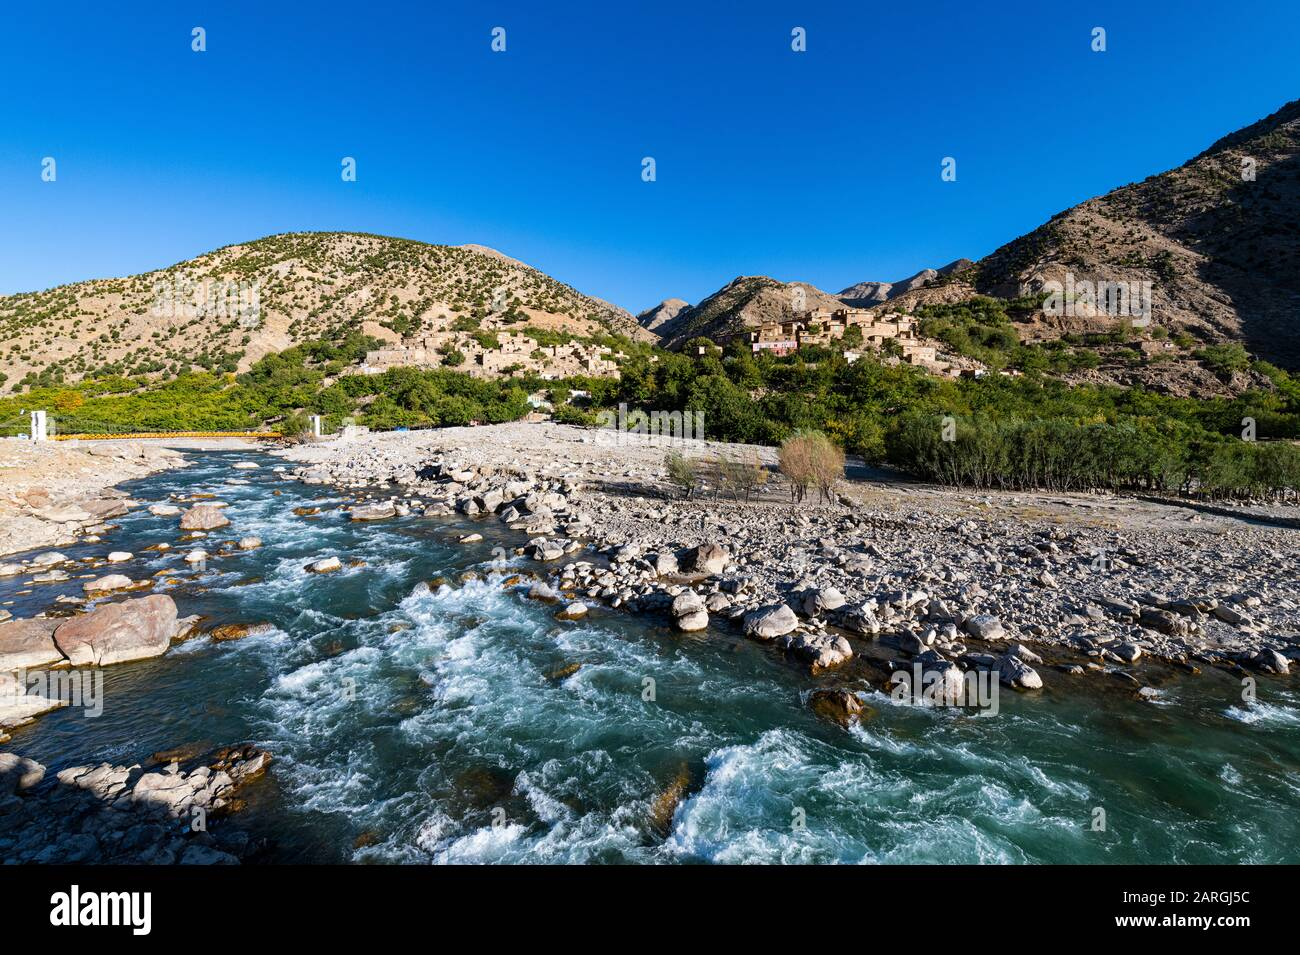 Panjshir River flowing through the Panjshir Valley, Afghanistan, Asia Stock Photo